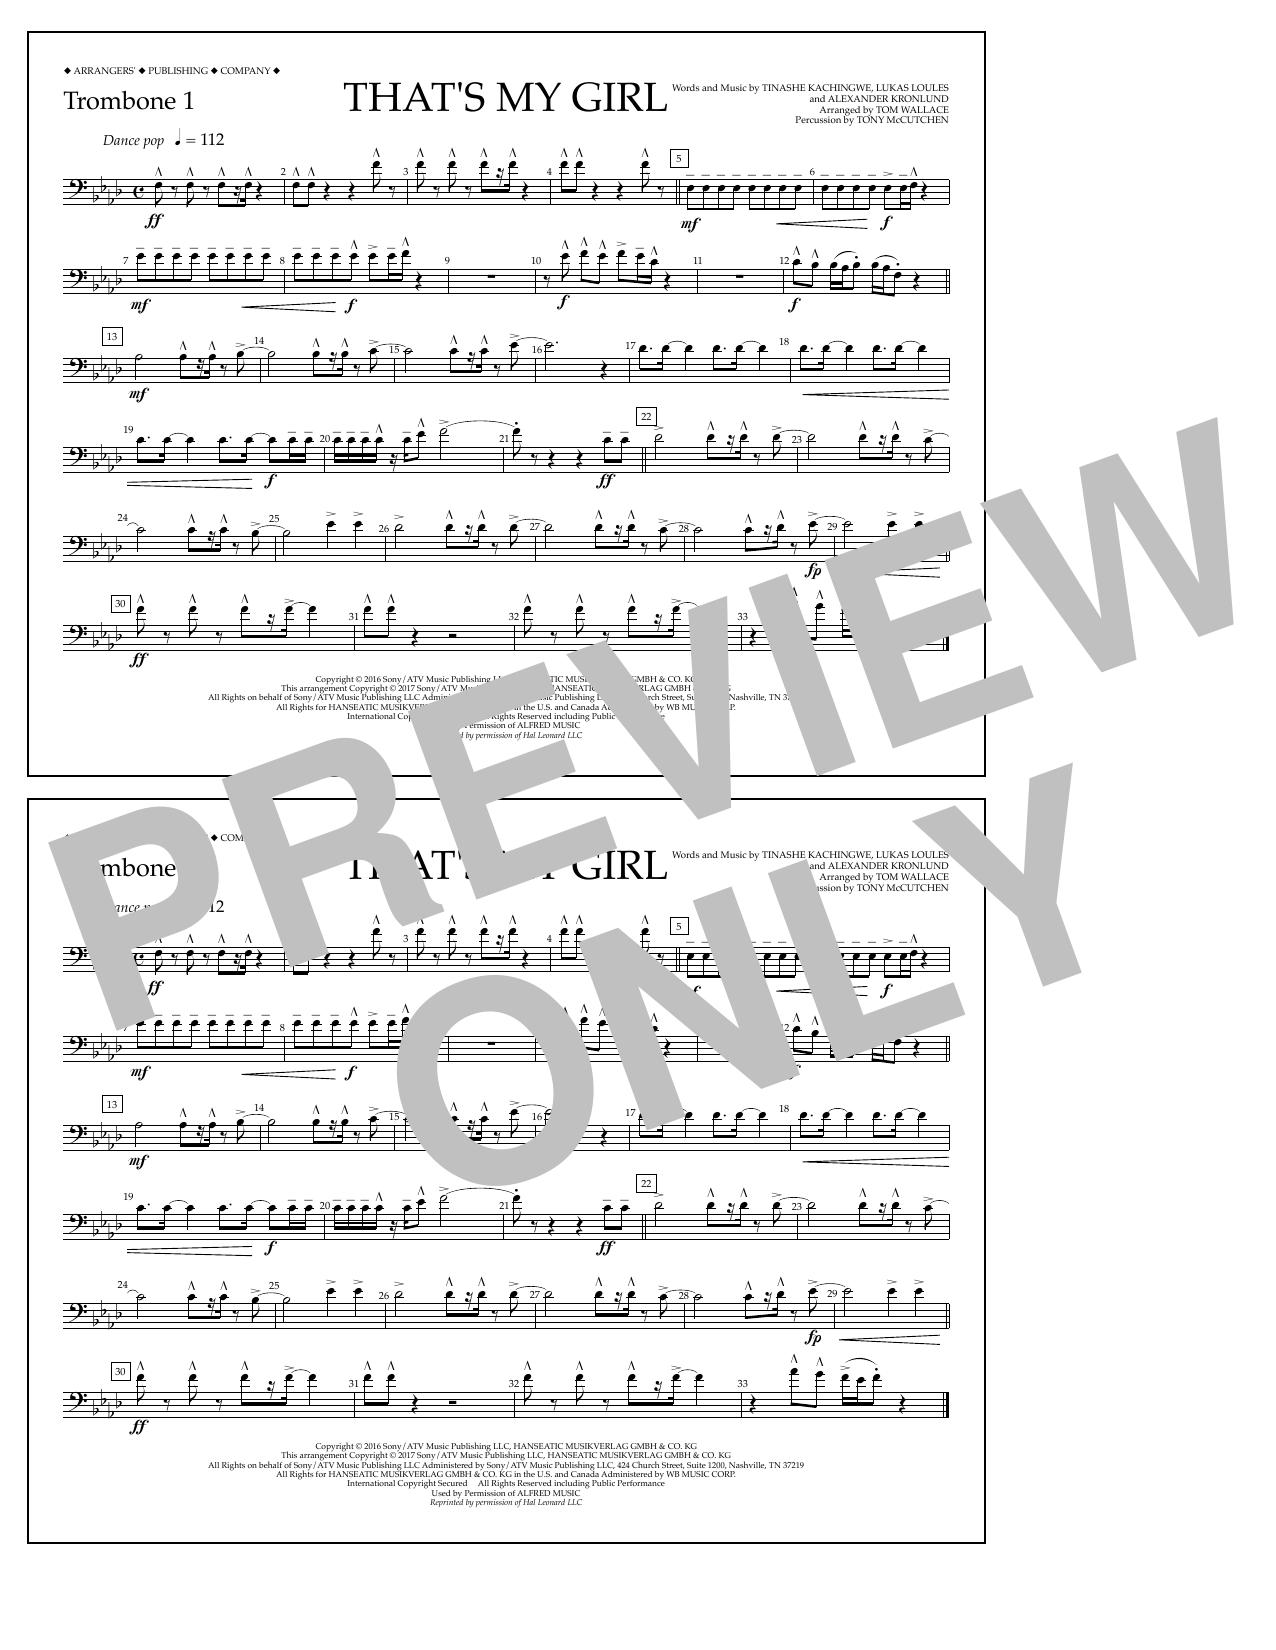 That's My Girl - Trombone 1 Sheet Music